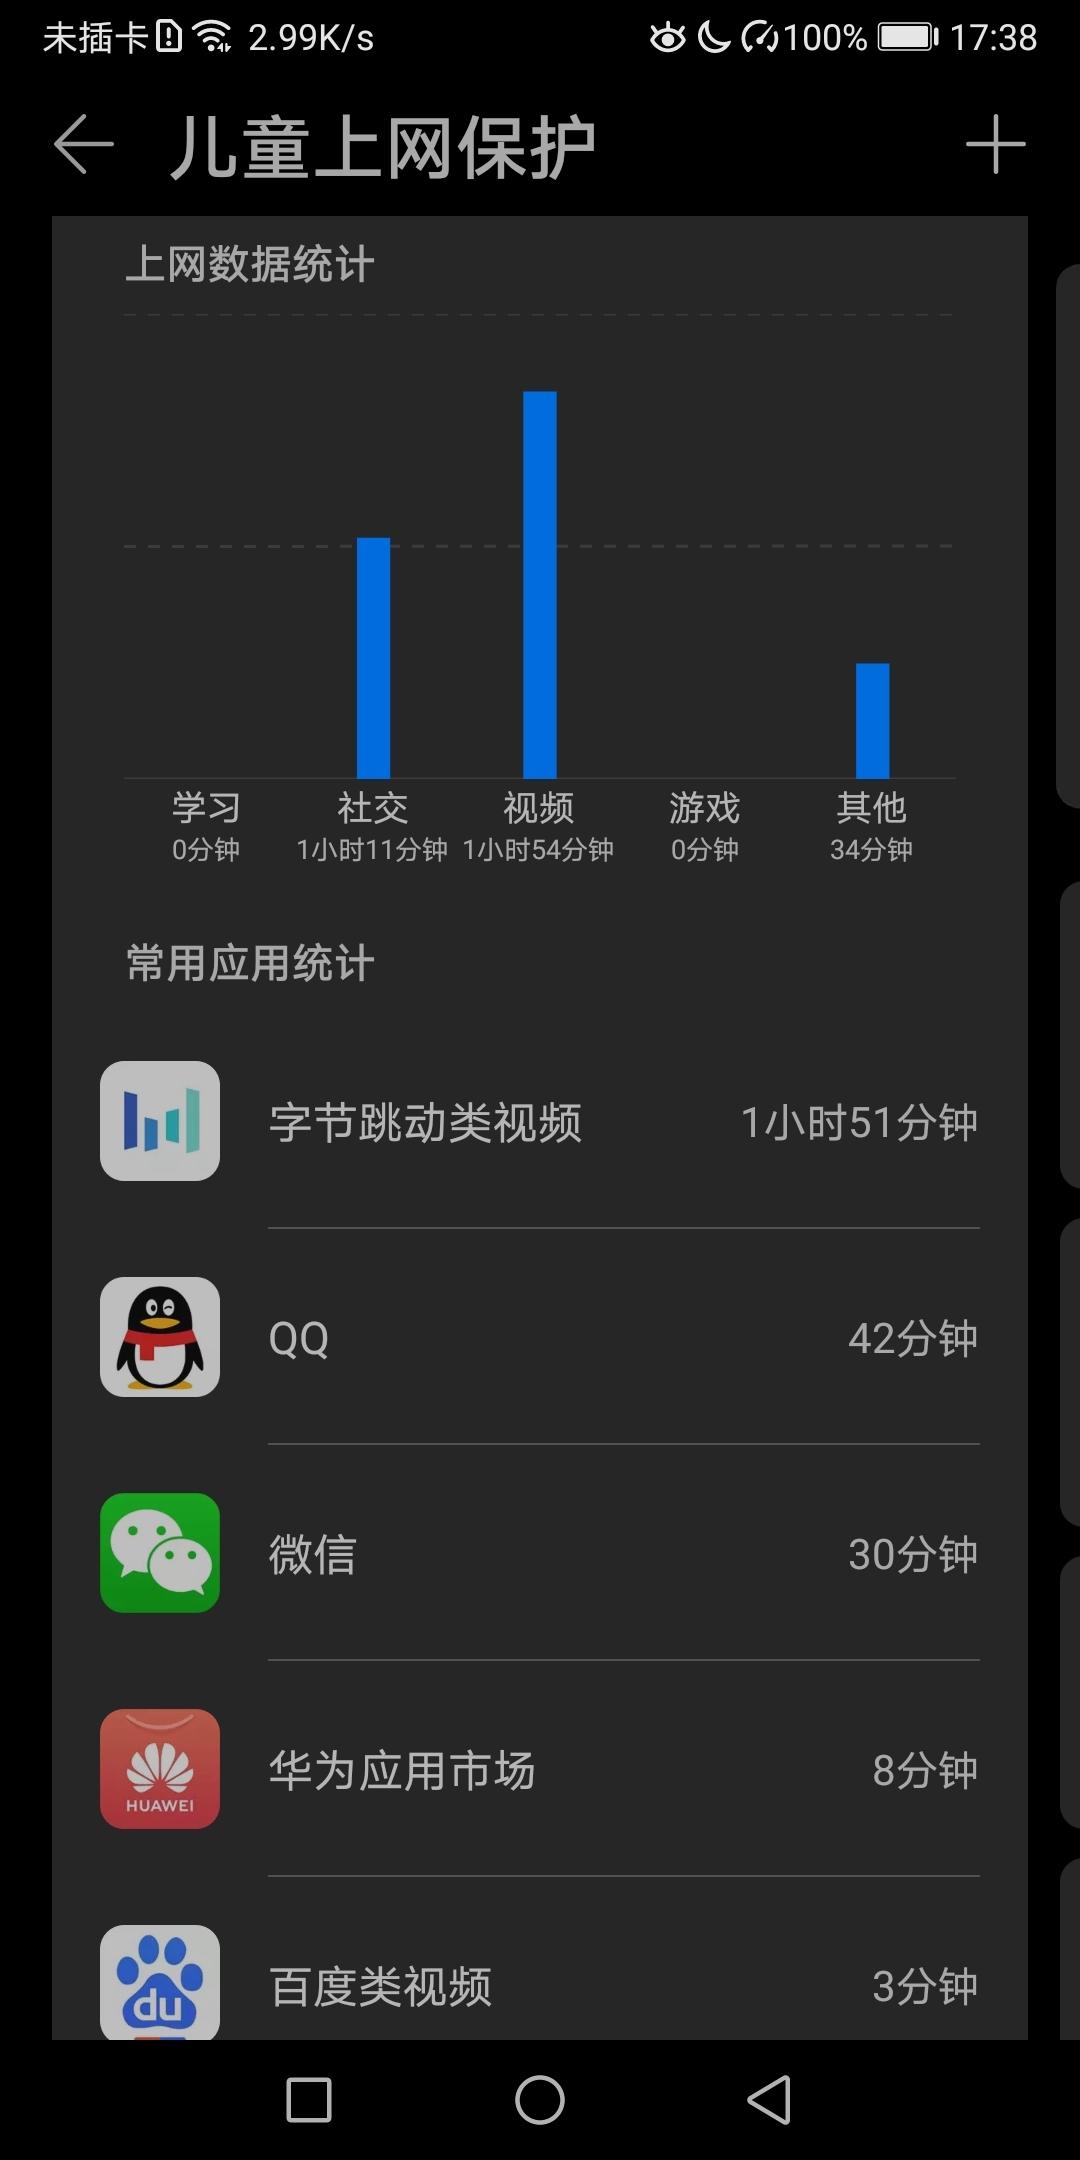 Screenshot_20200516_173821_com.huawei.smarthome.jpg